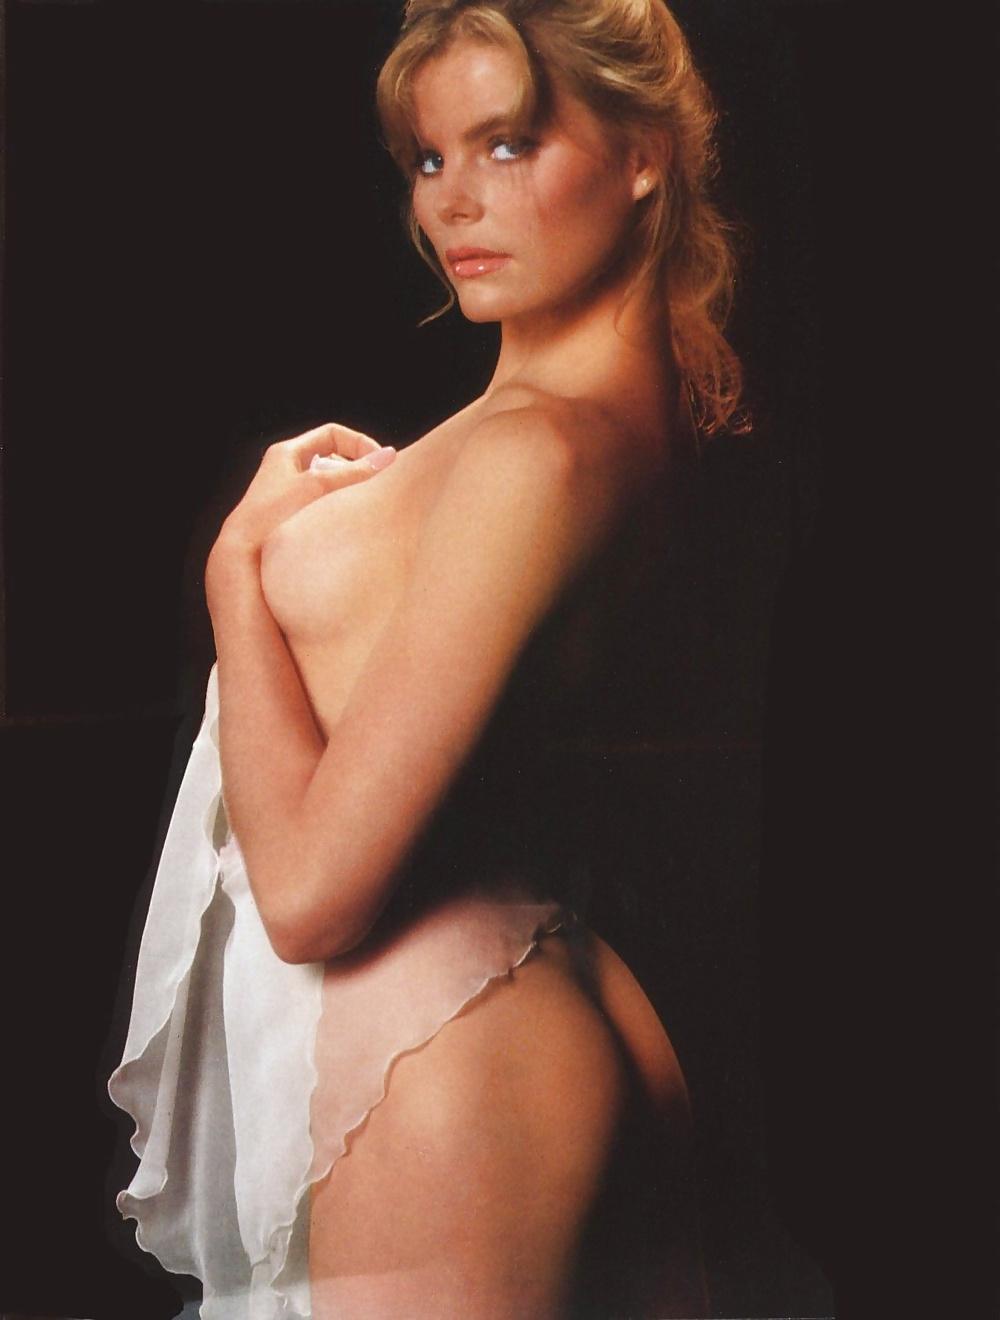 Mariel hemmingway playboy, girls nipples in tee shirts